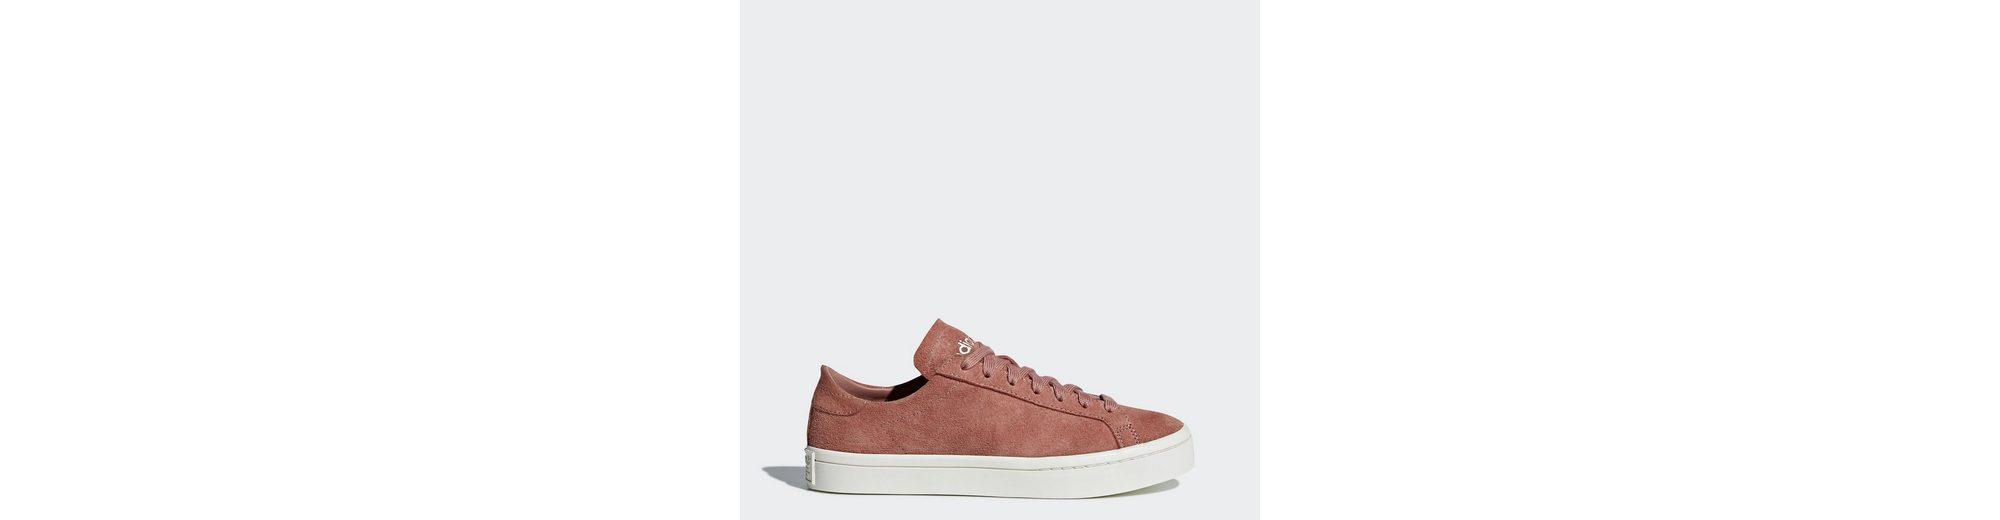 adidas Originals Court Vantage Schuh Sneaker